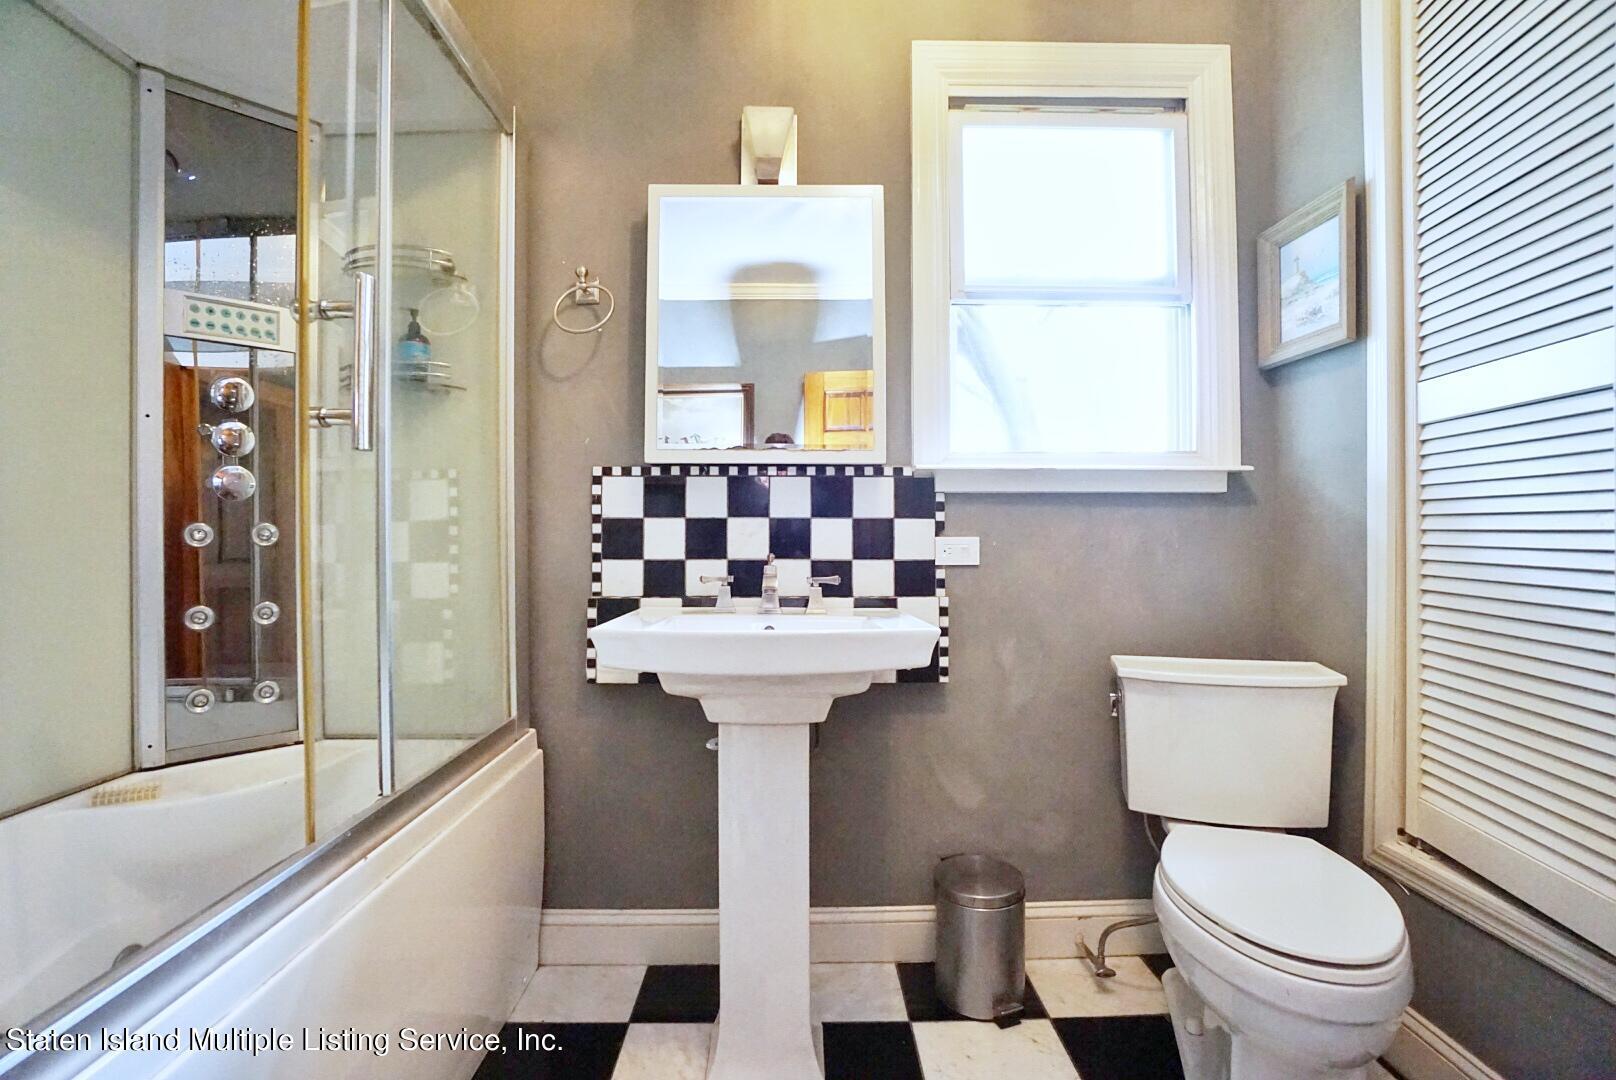 Single Family - Detached 136 York Avenue  Staten Island, NY 10301, MLS-1147575-37